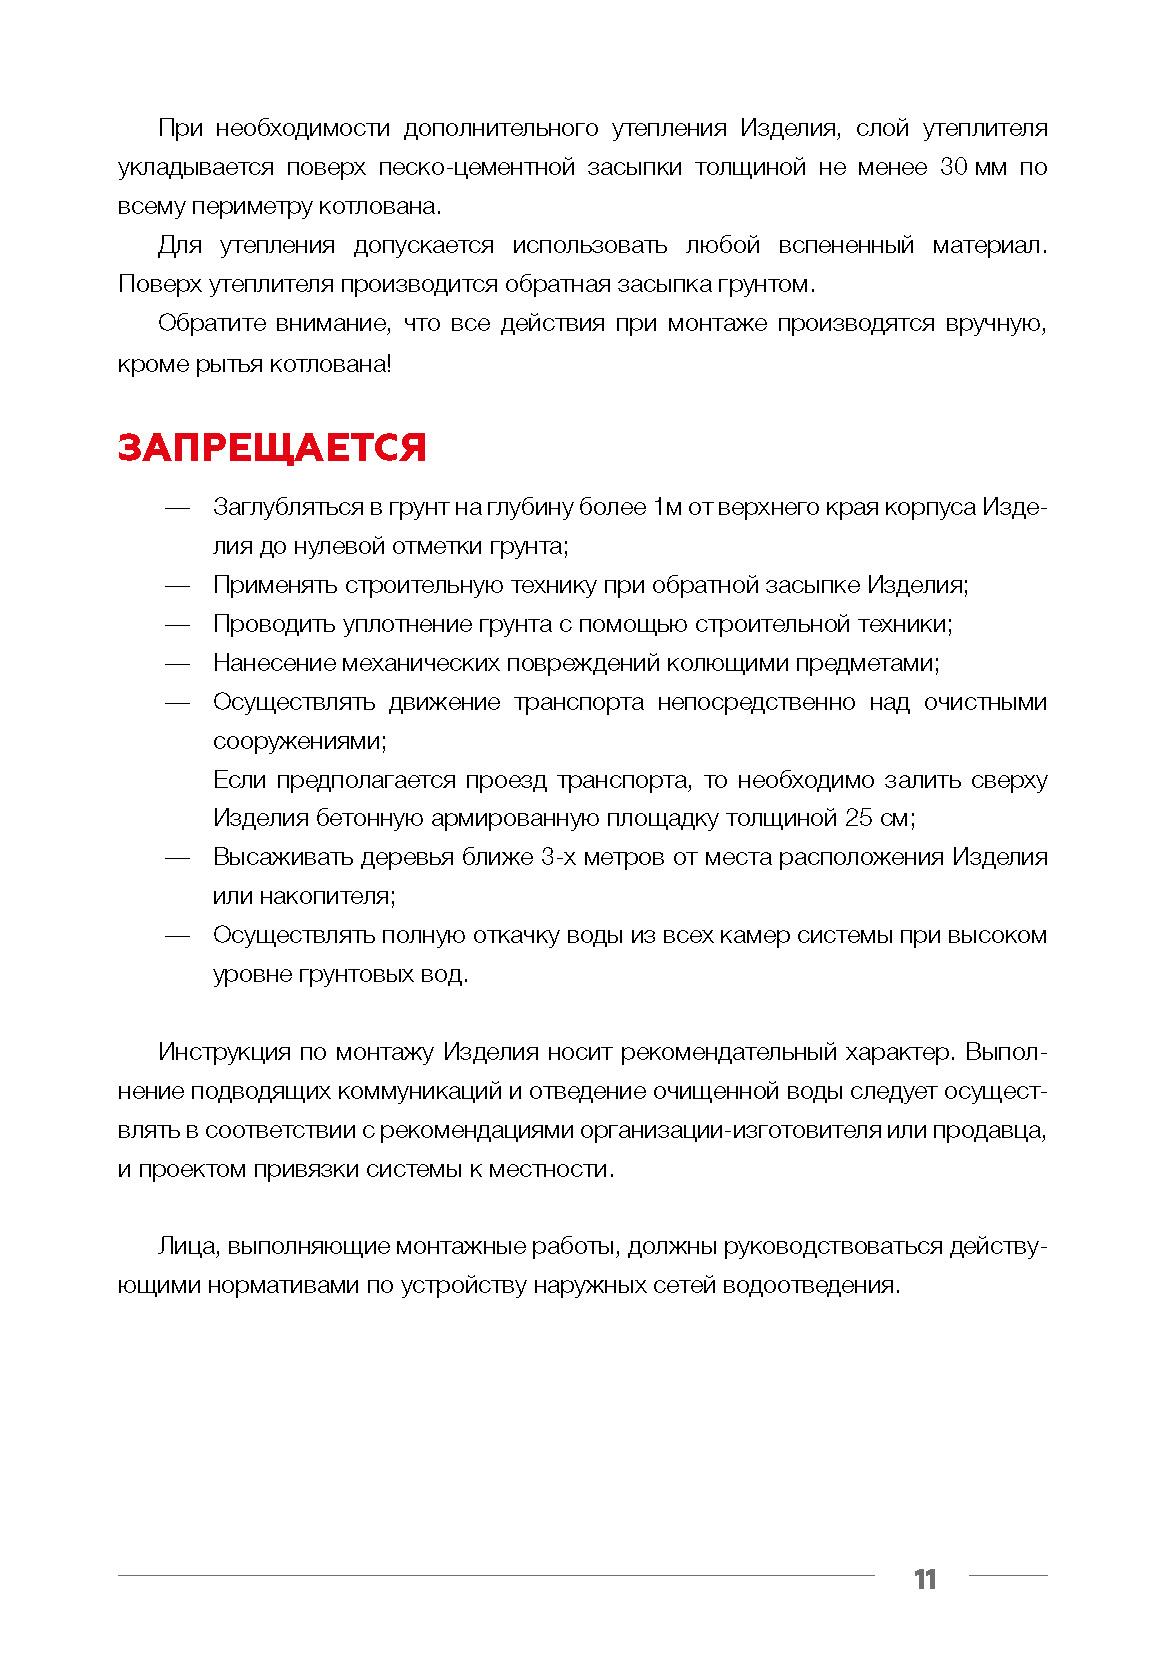 Технический паспорт Евролос Био_Страница_13